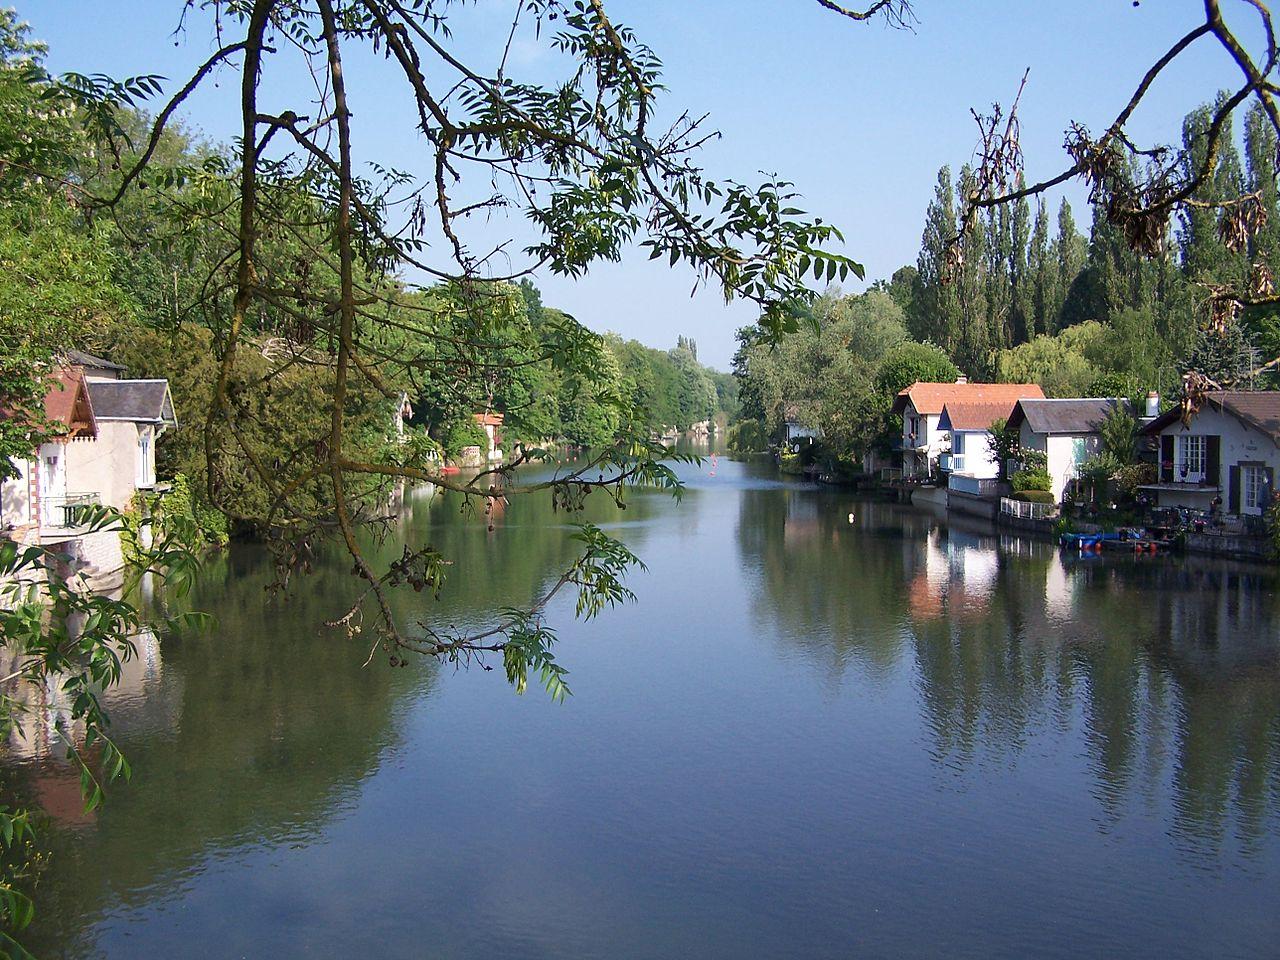 Olivet na f gabrielle moreau lefebvre paysage loiret 1920 for Region loiret